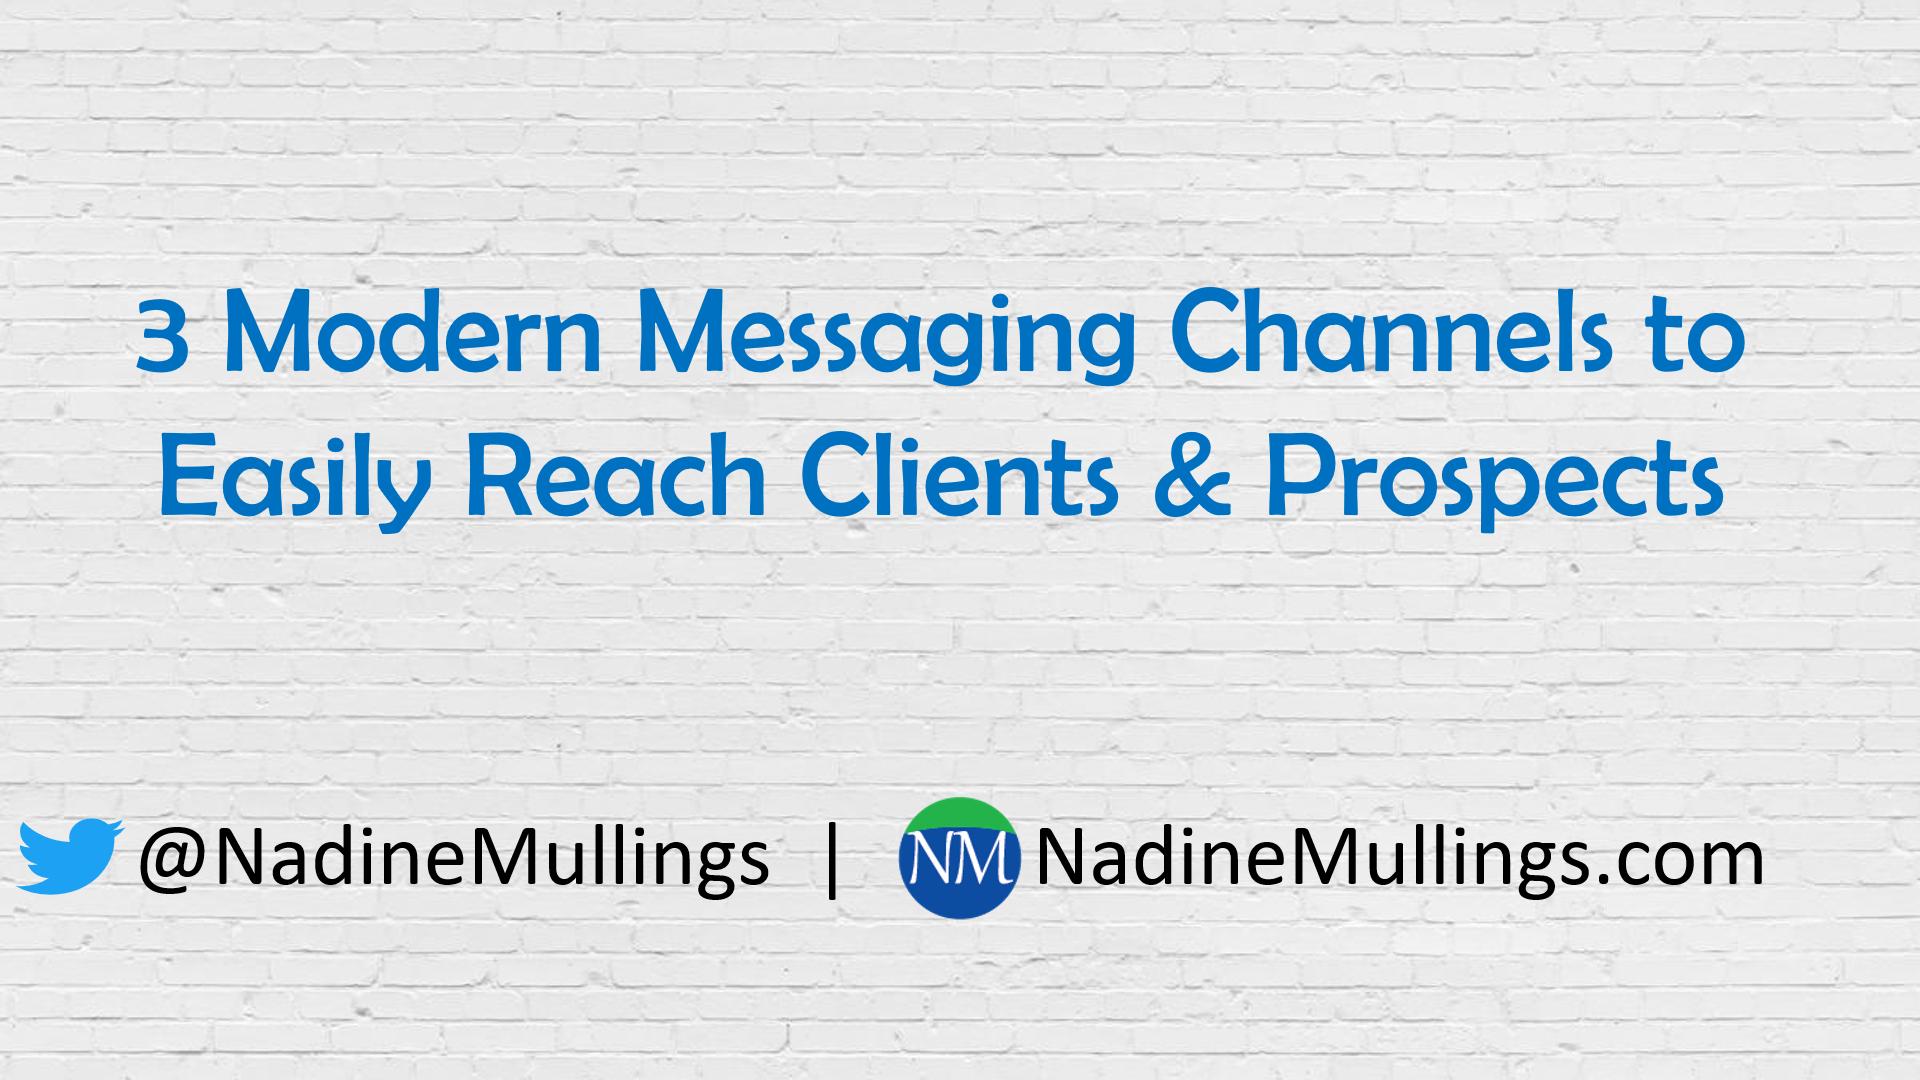 3 Modern Messaging Channels